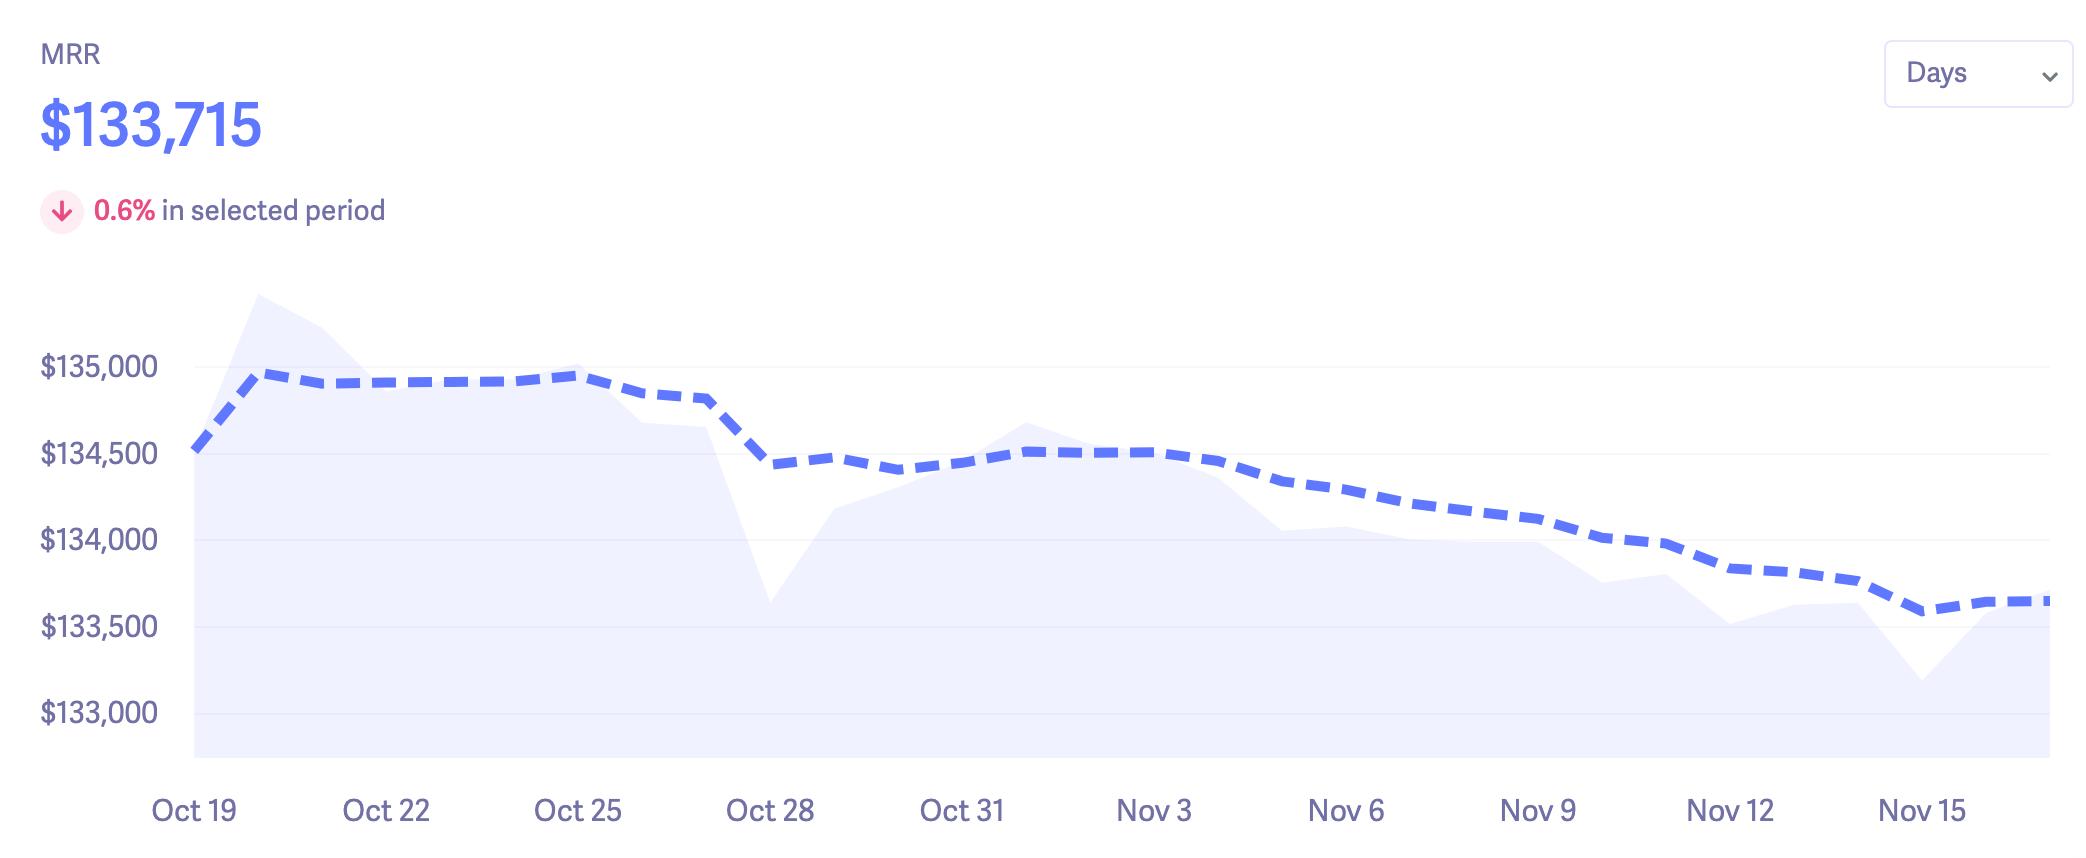 moving trend line - mrr